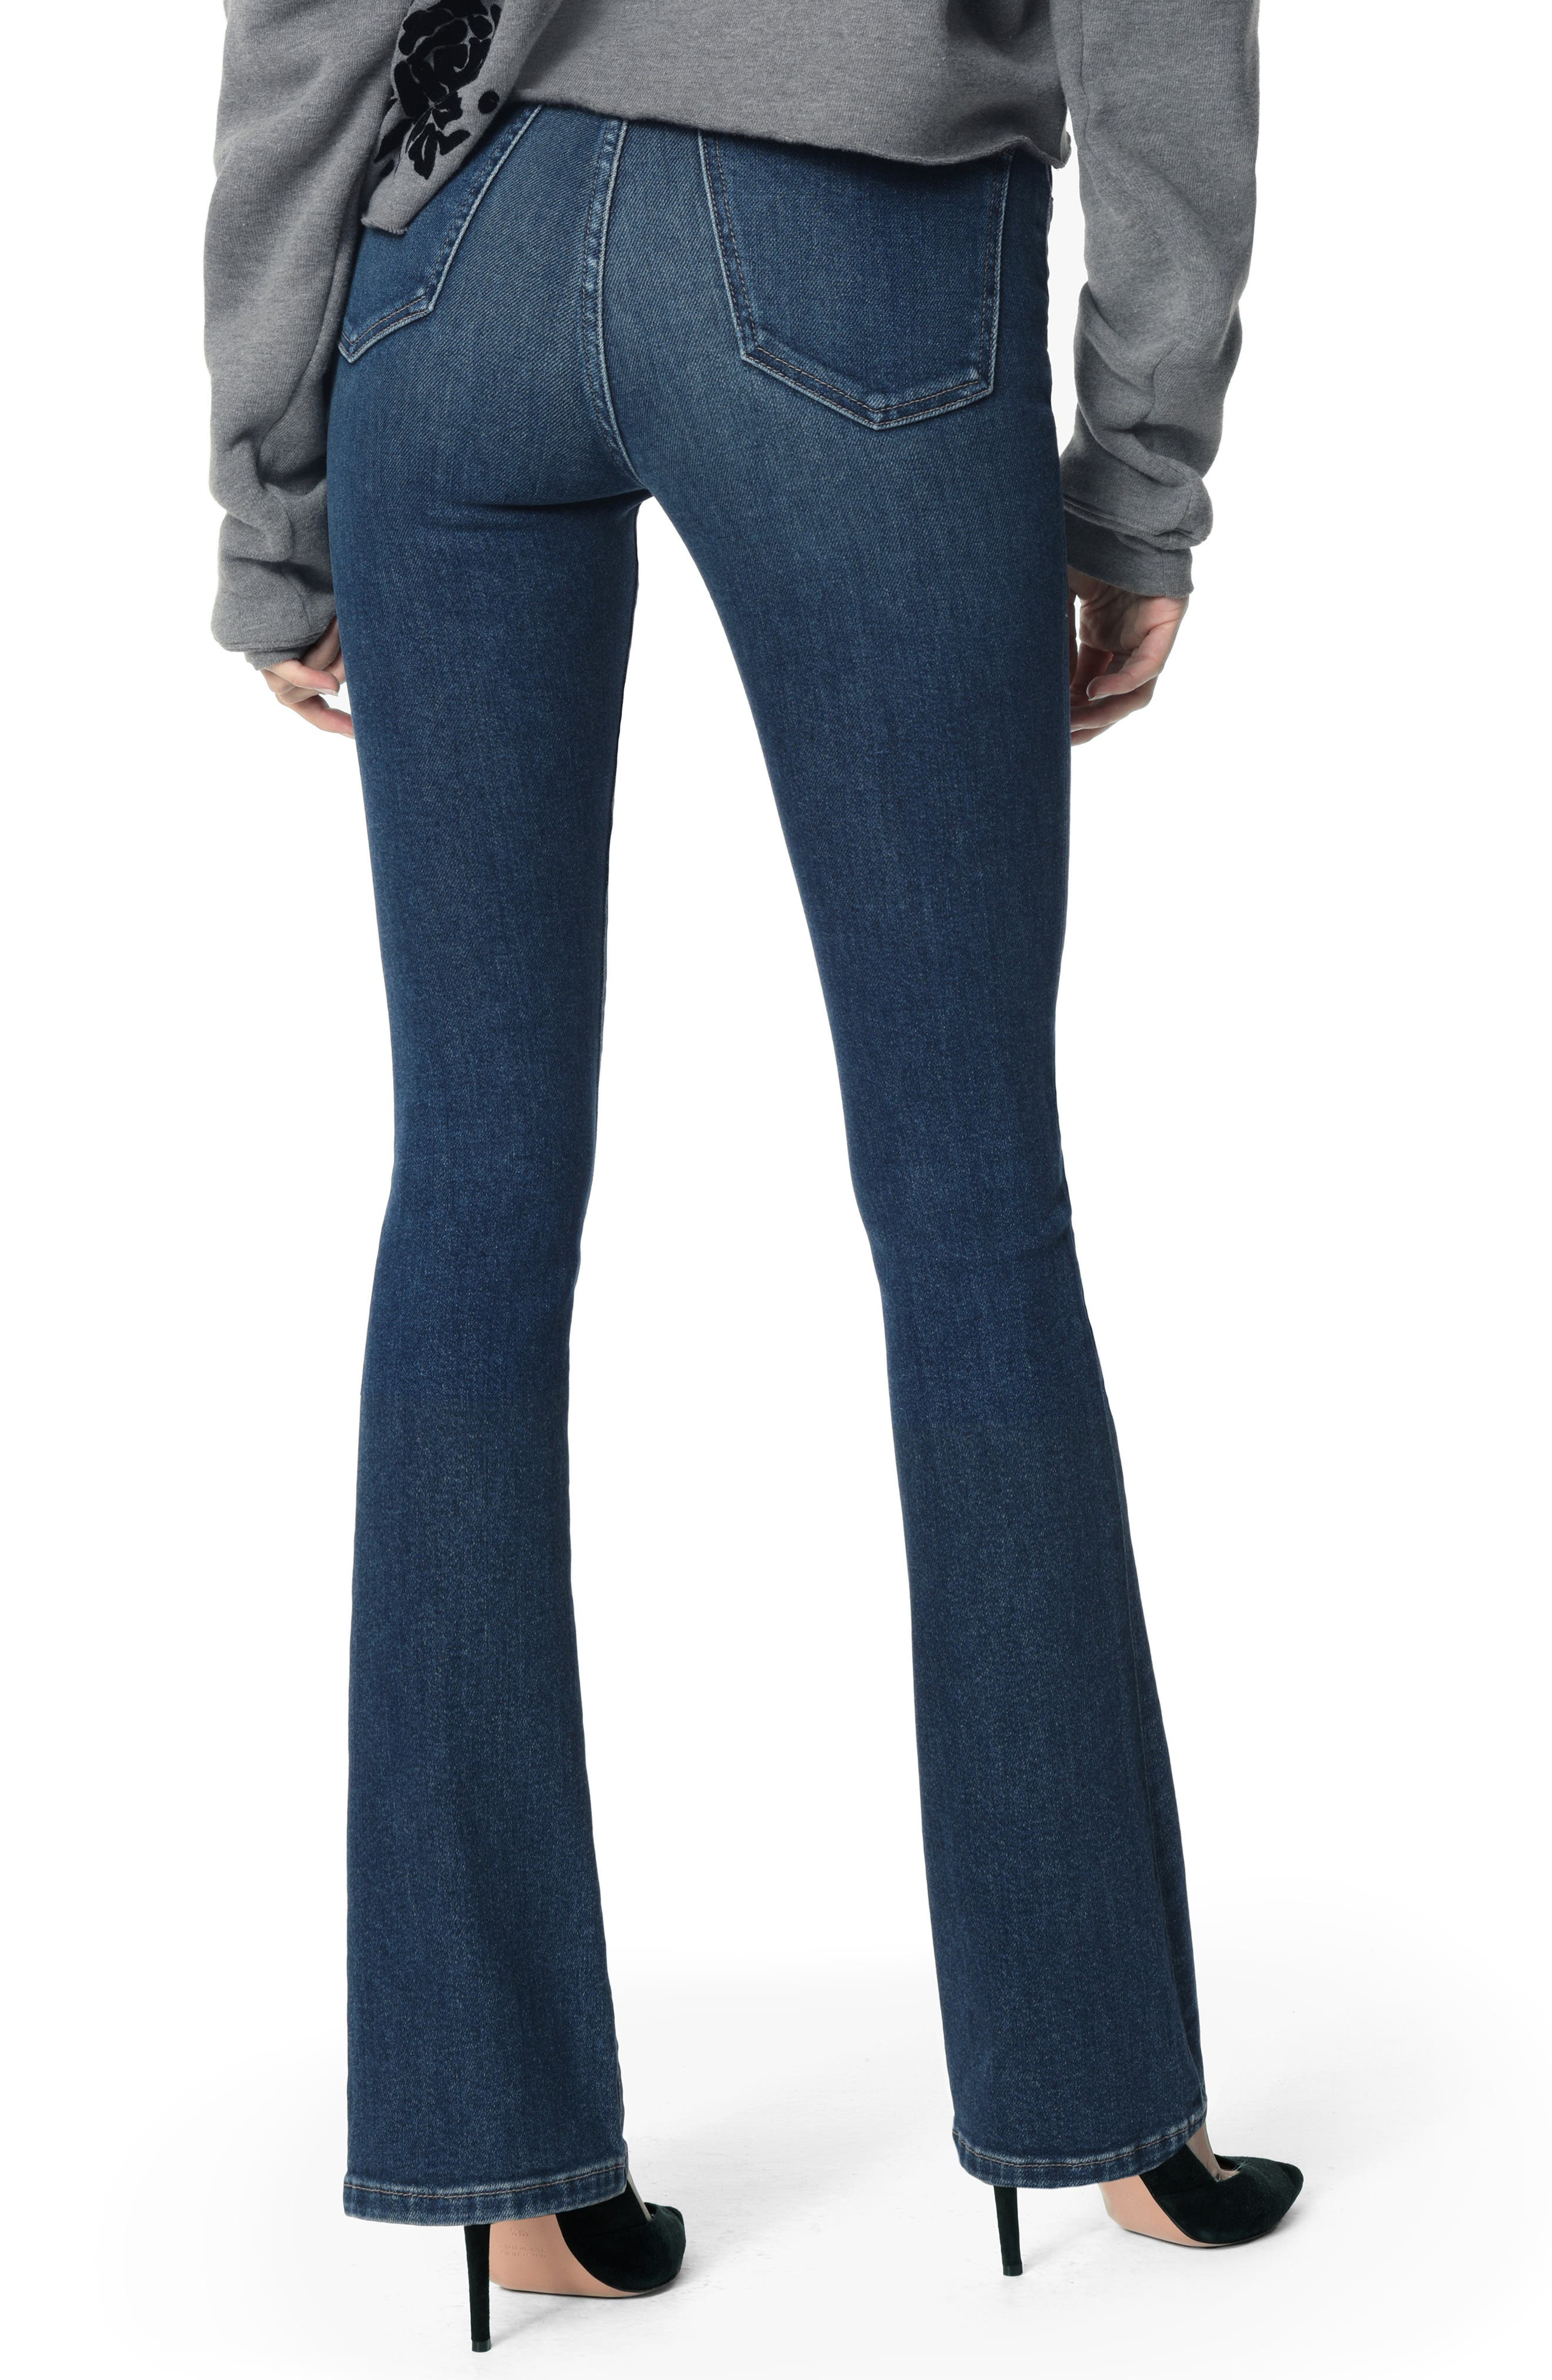 JOE'S, Honey Curvy High Waist Bootcut Jeans, Alternate thumbnail 2, color, 420